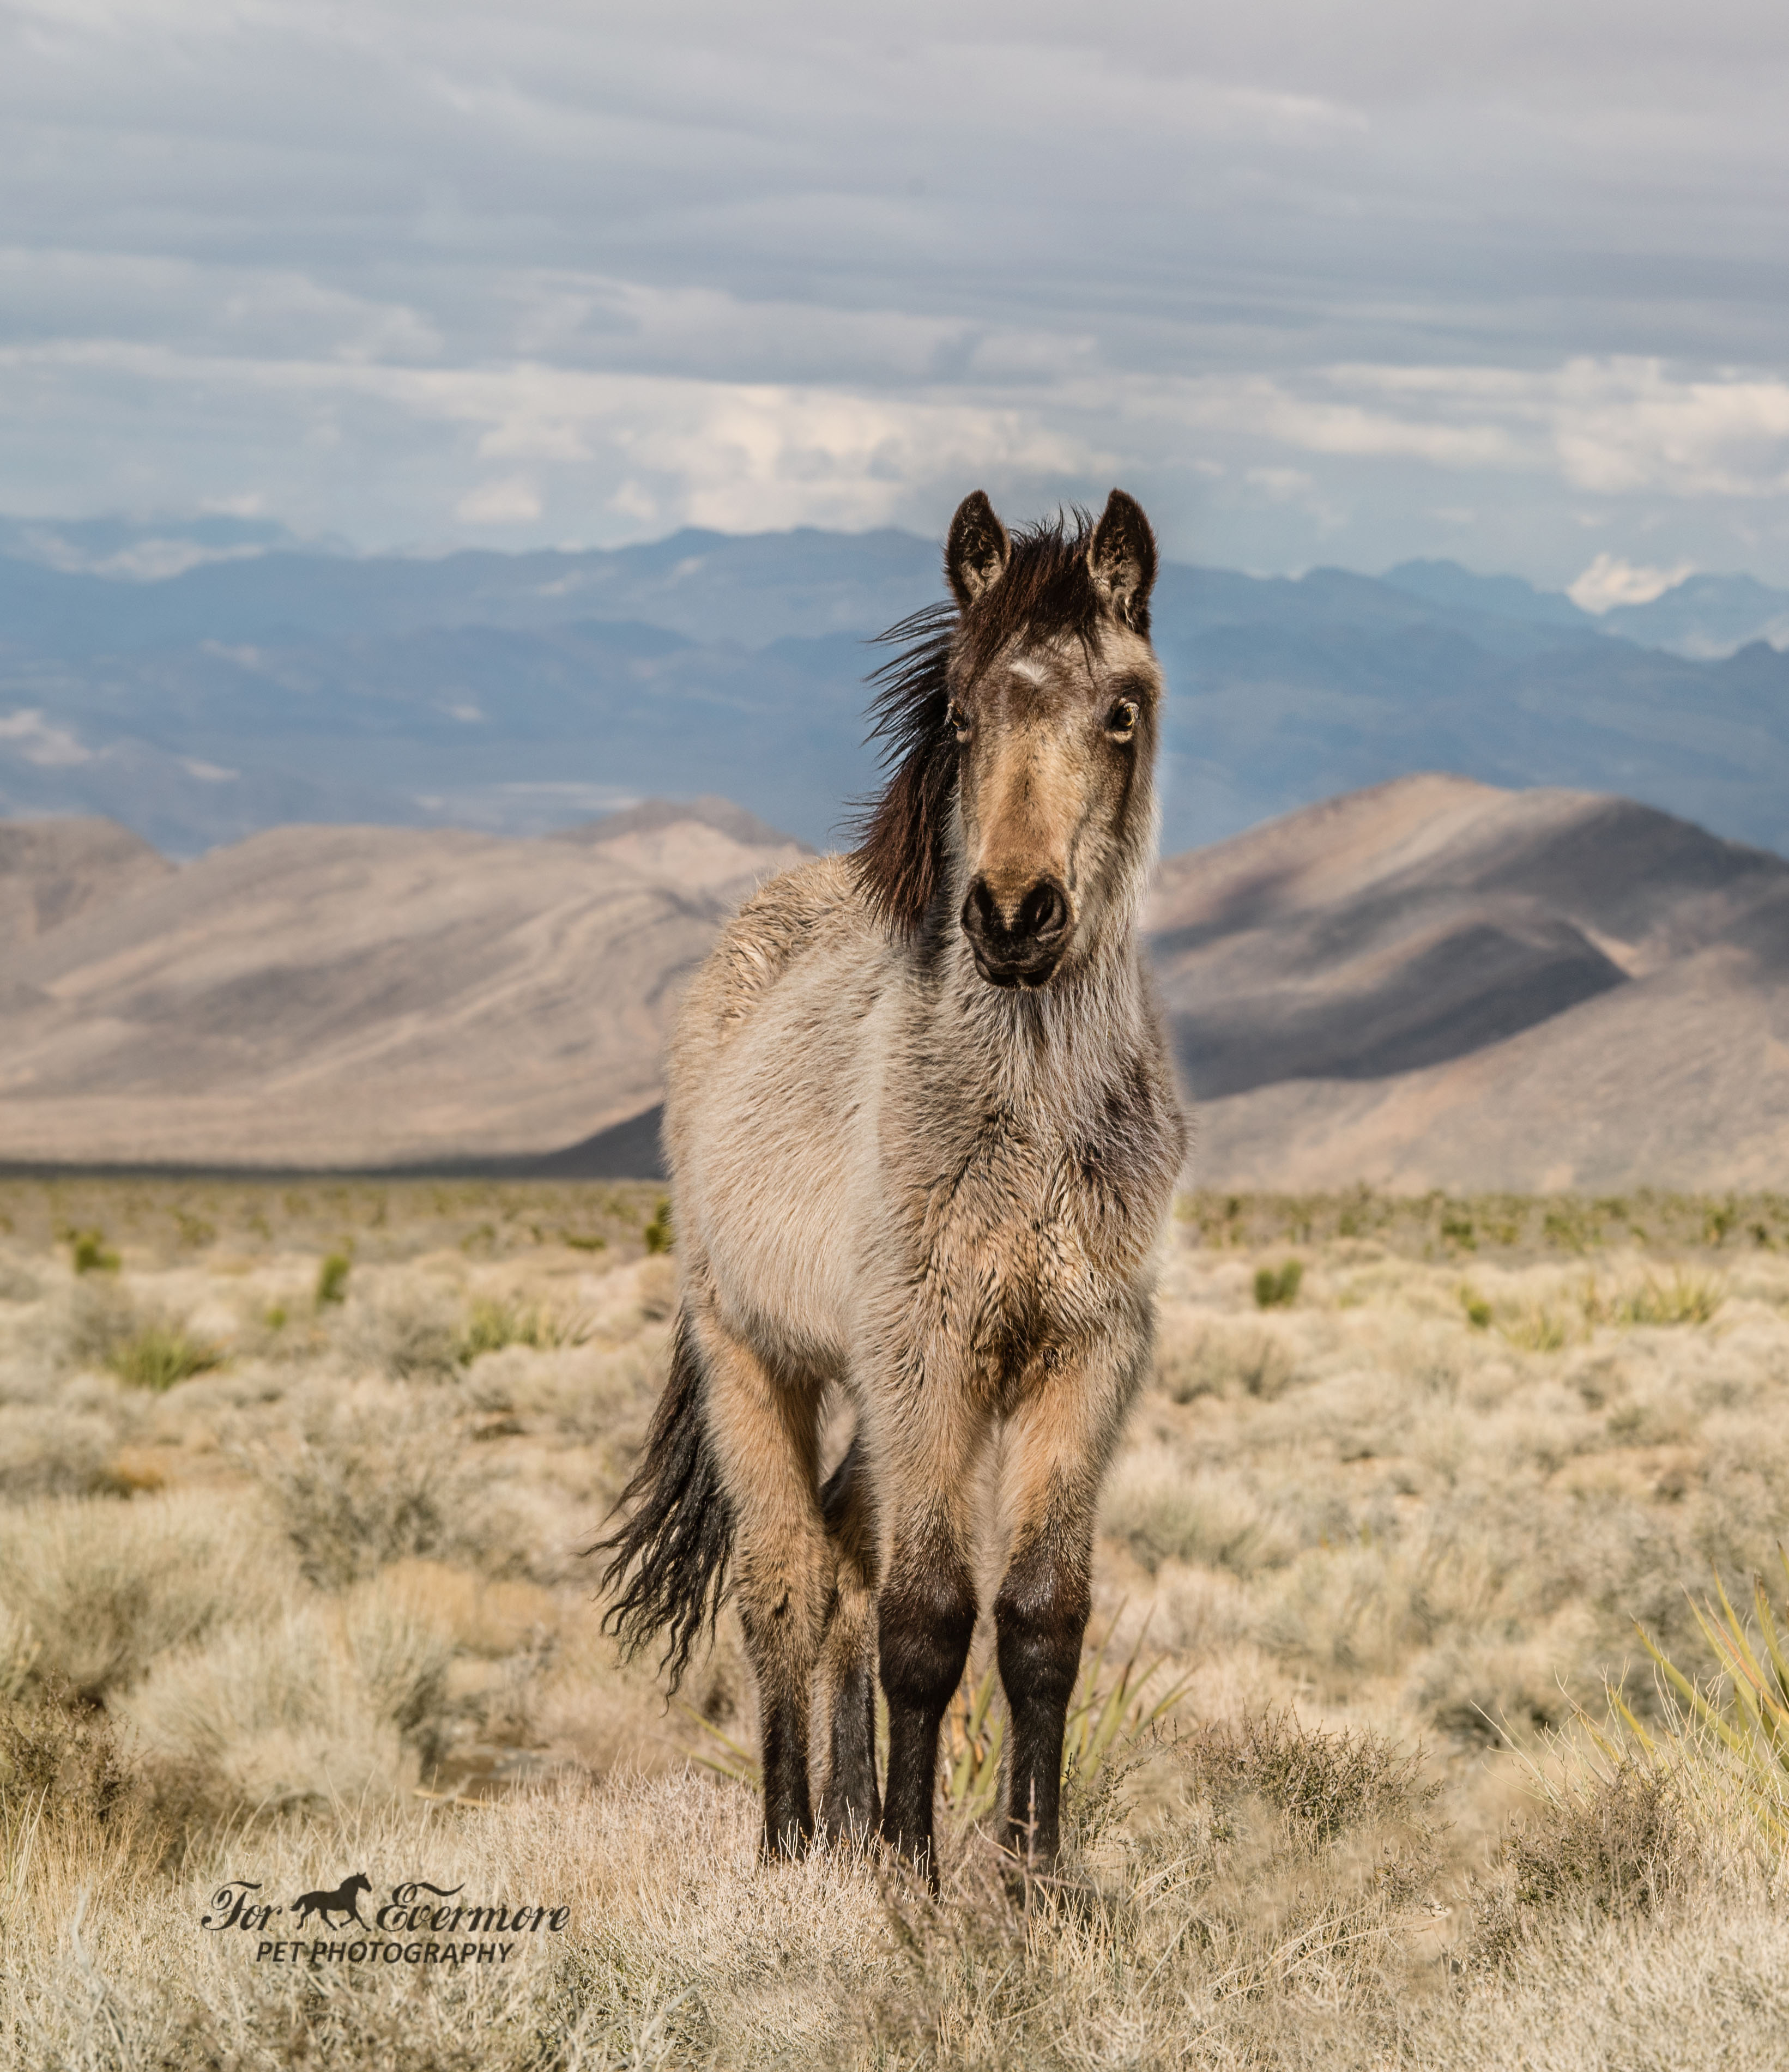 Yearling Buckskin wild horse